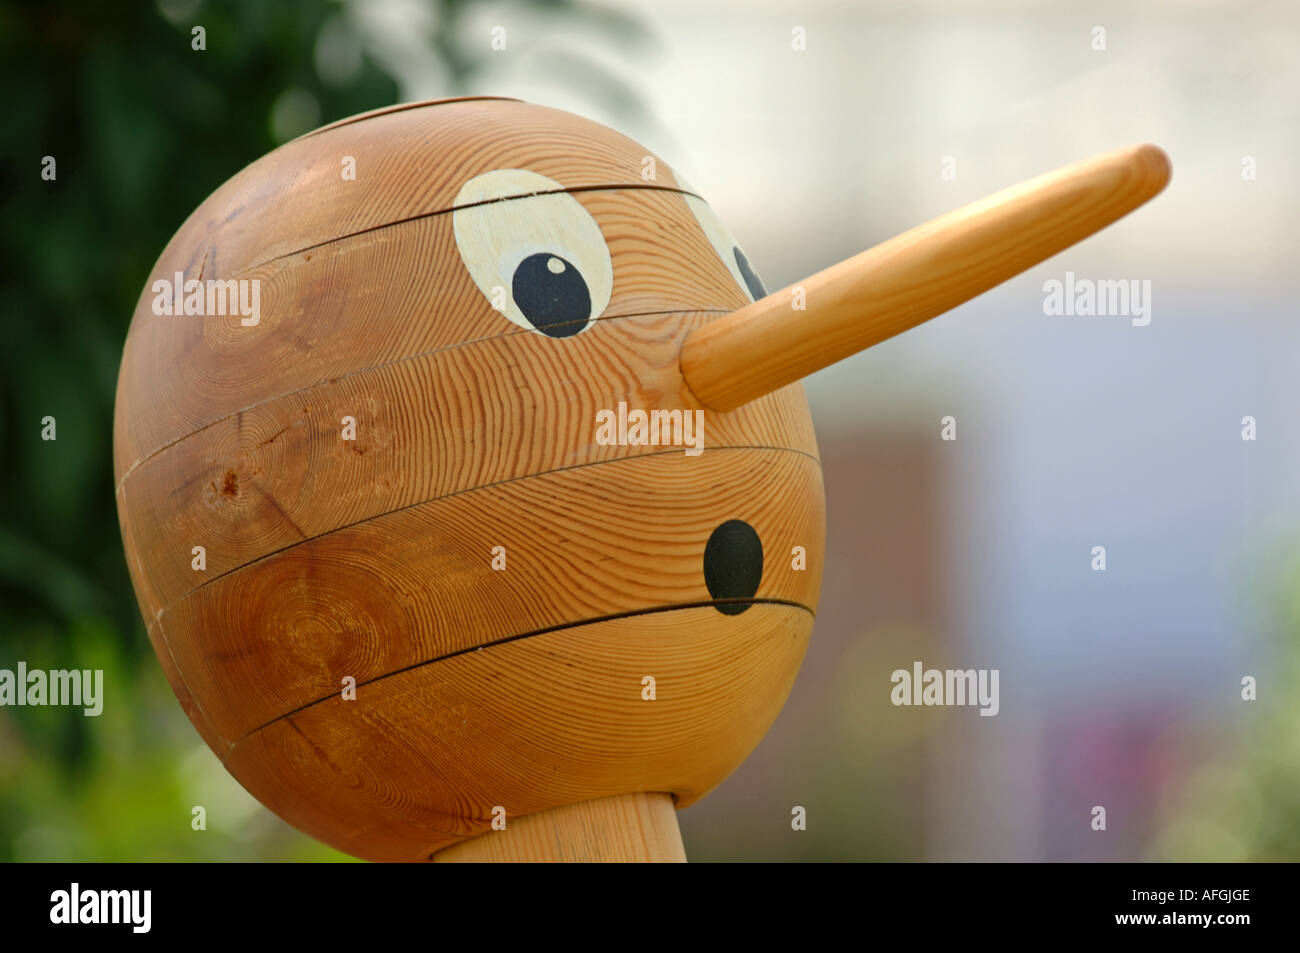 Pinocchio - Stock Image